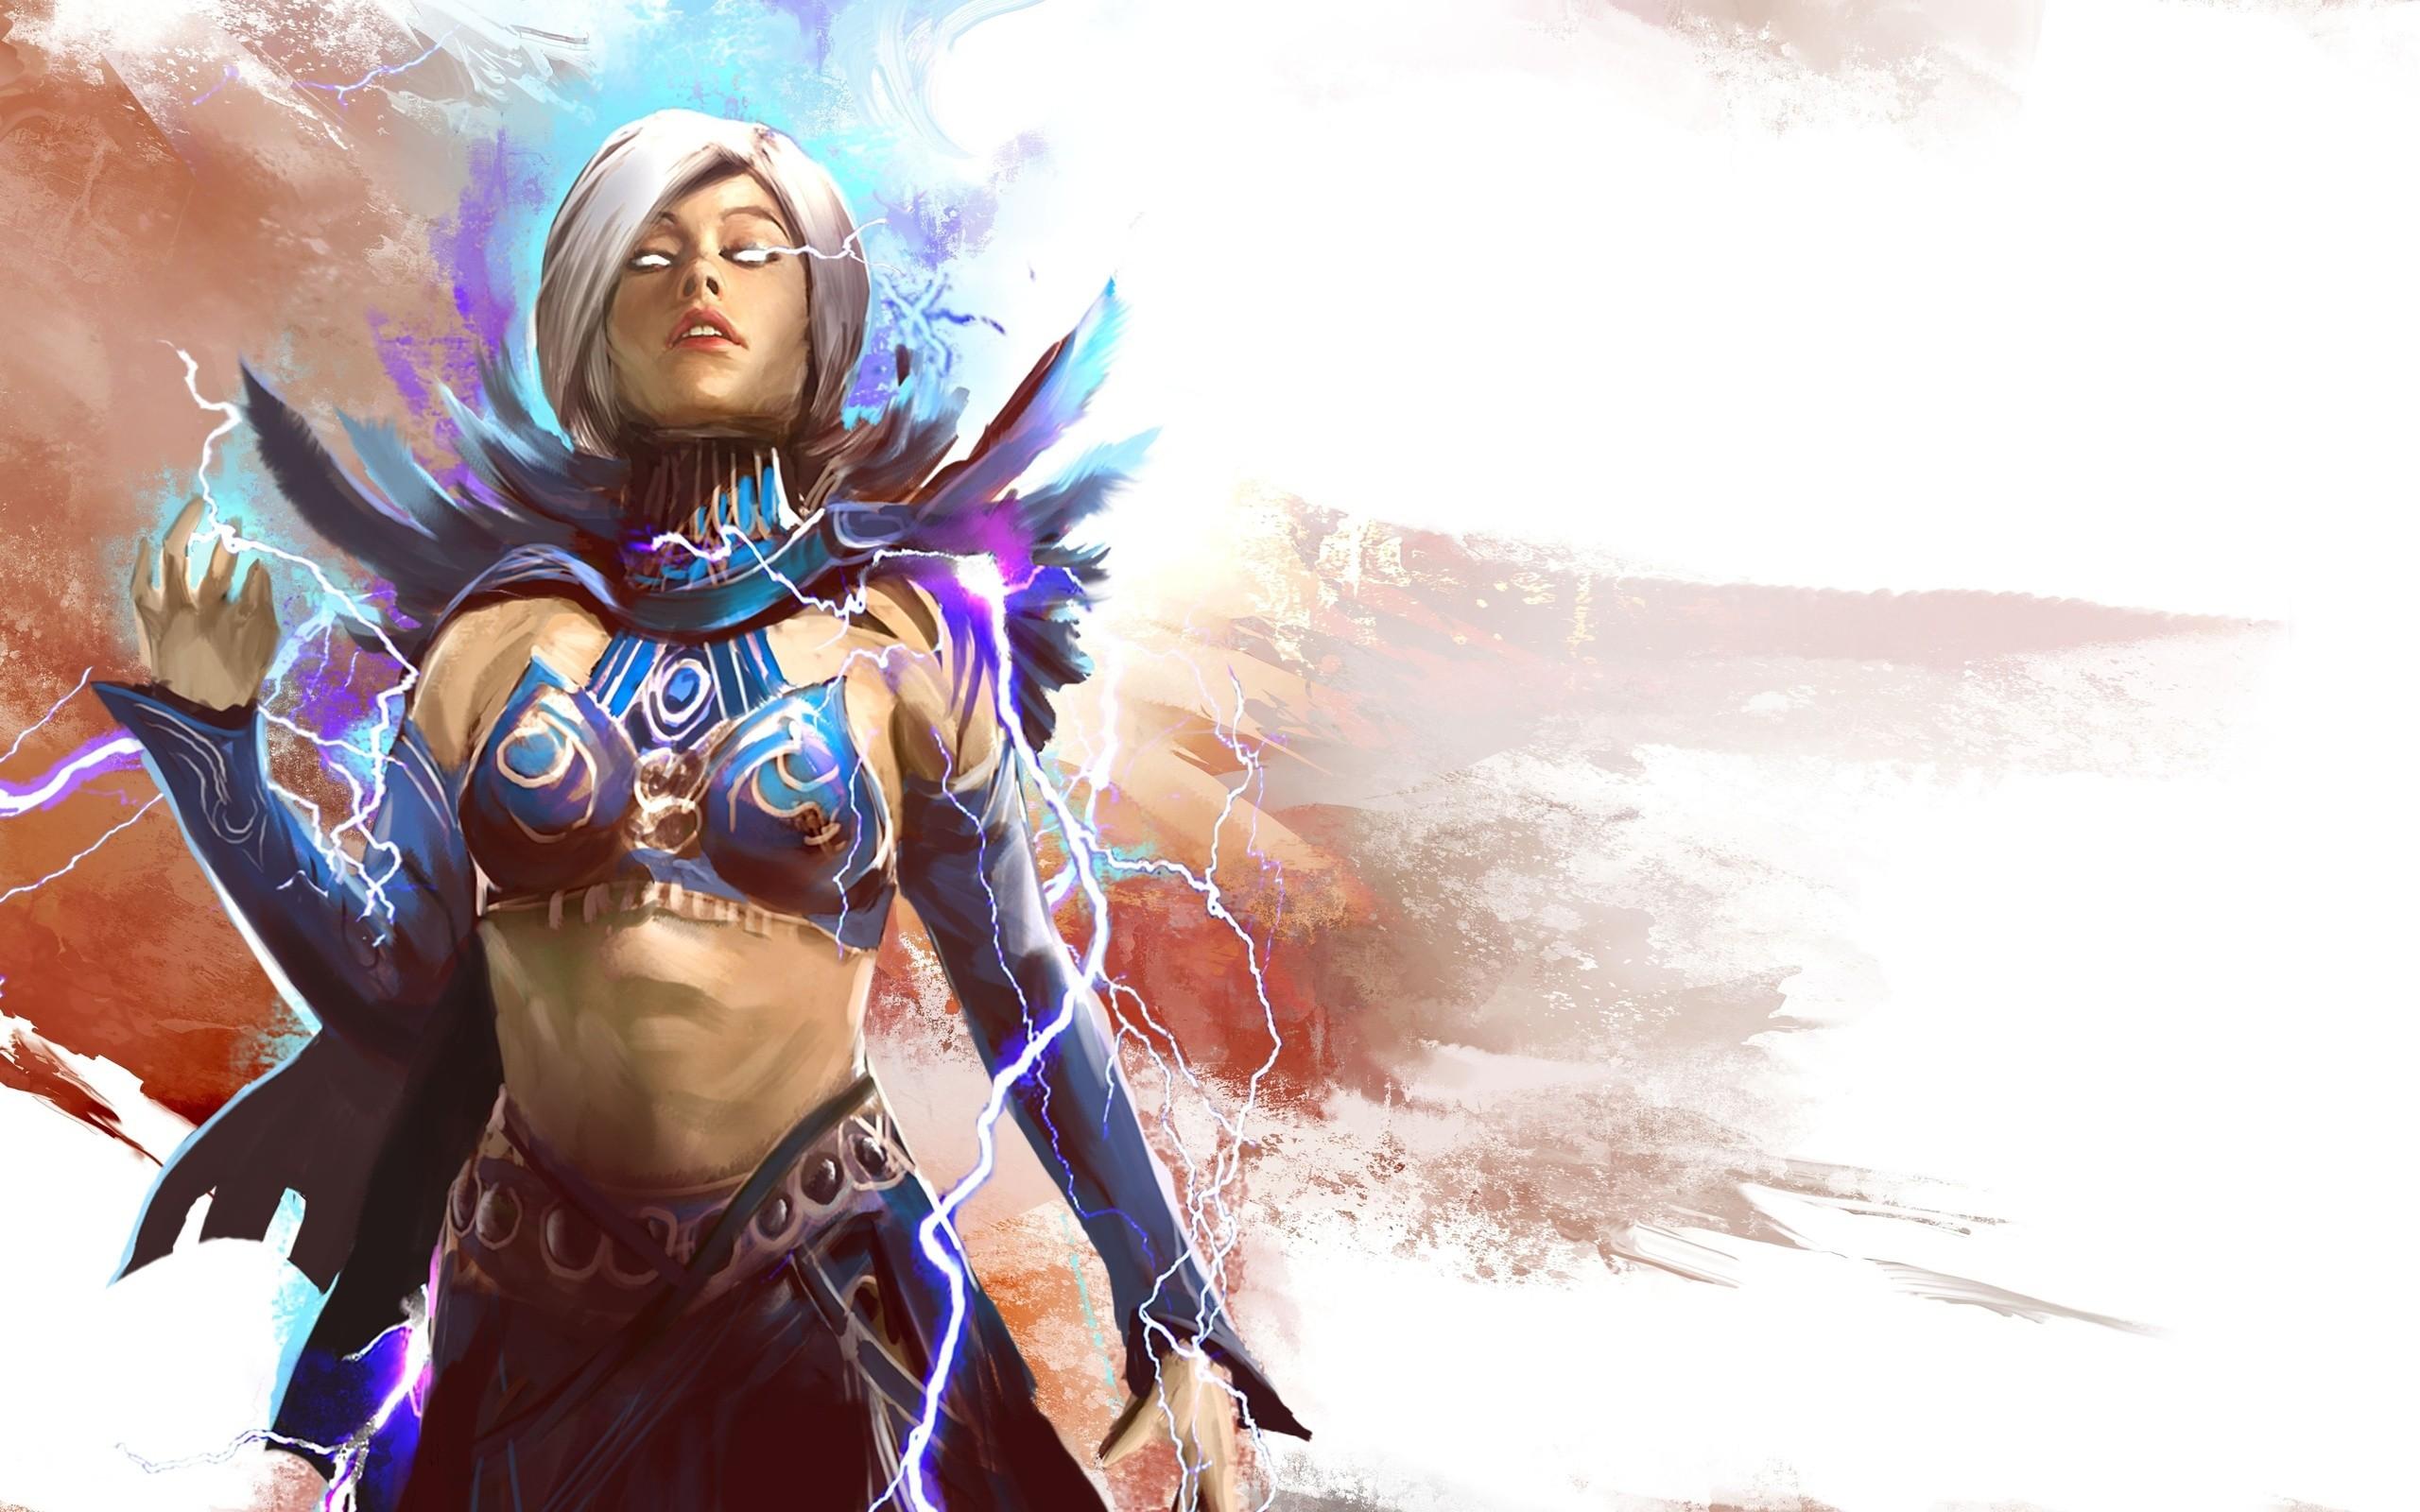 women, Mage, video games, fantasy art, artwork, Guild Wars 2, white ...